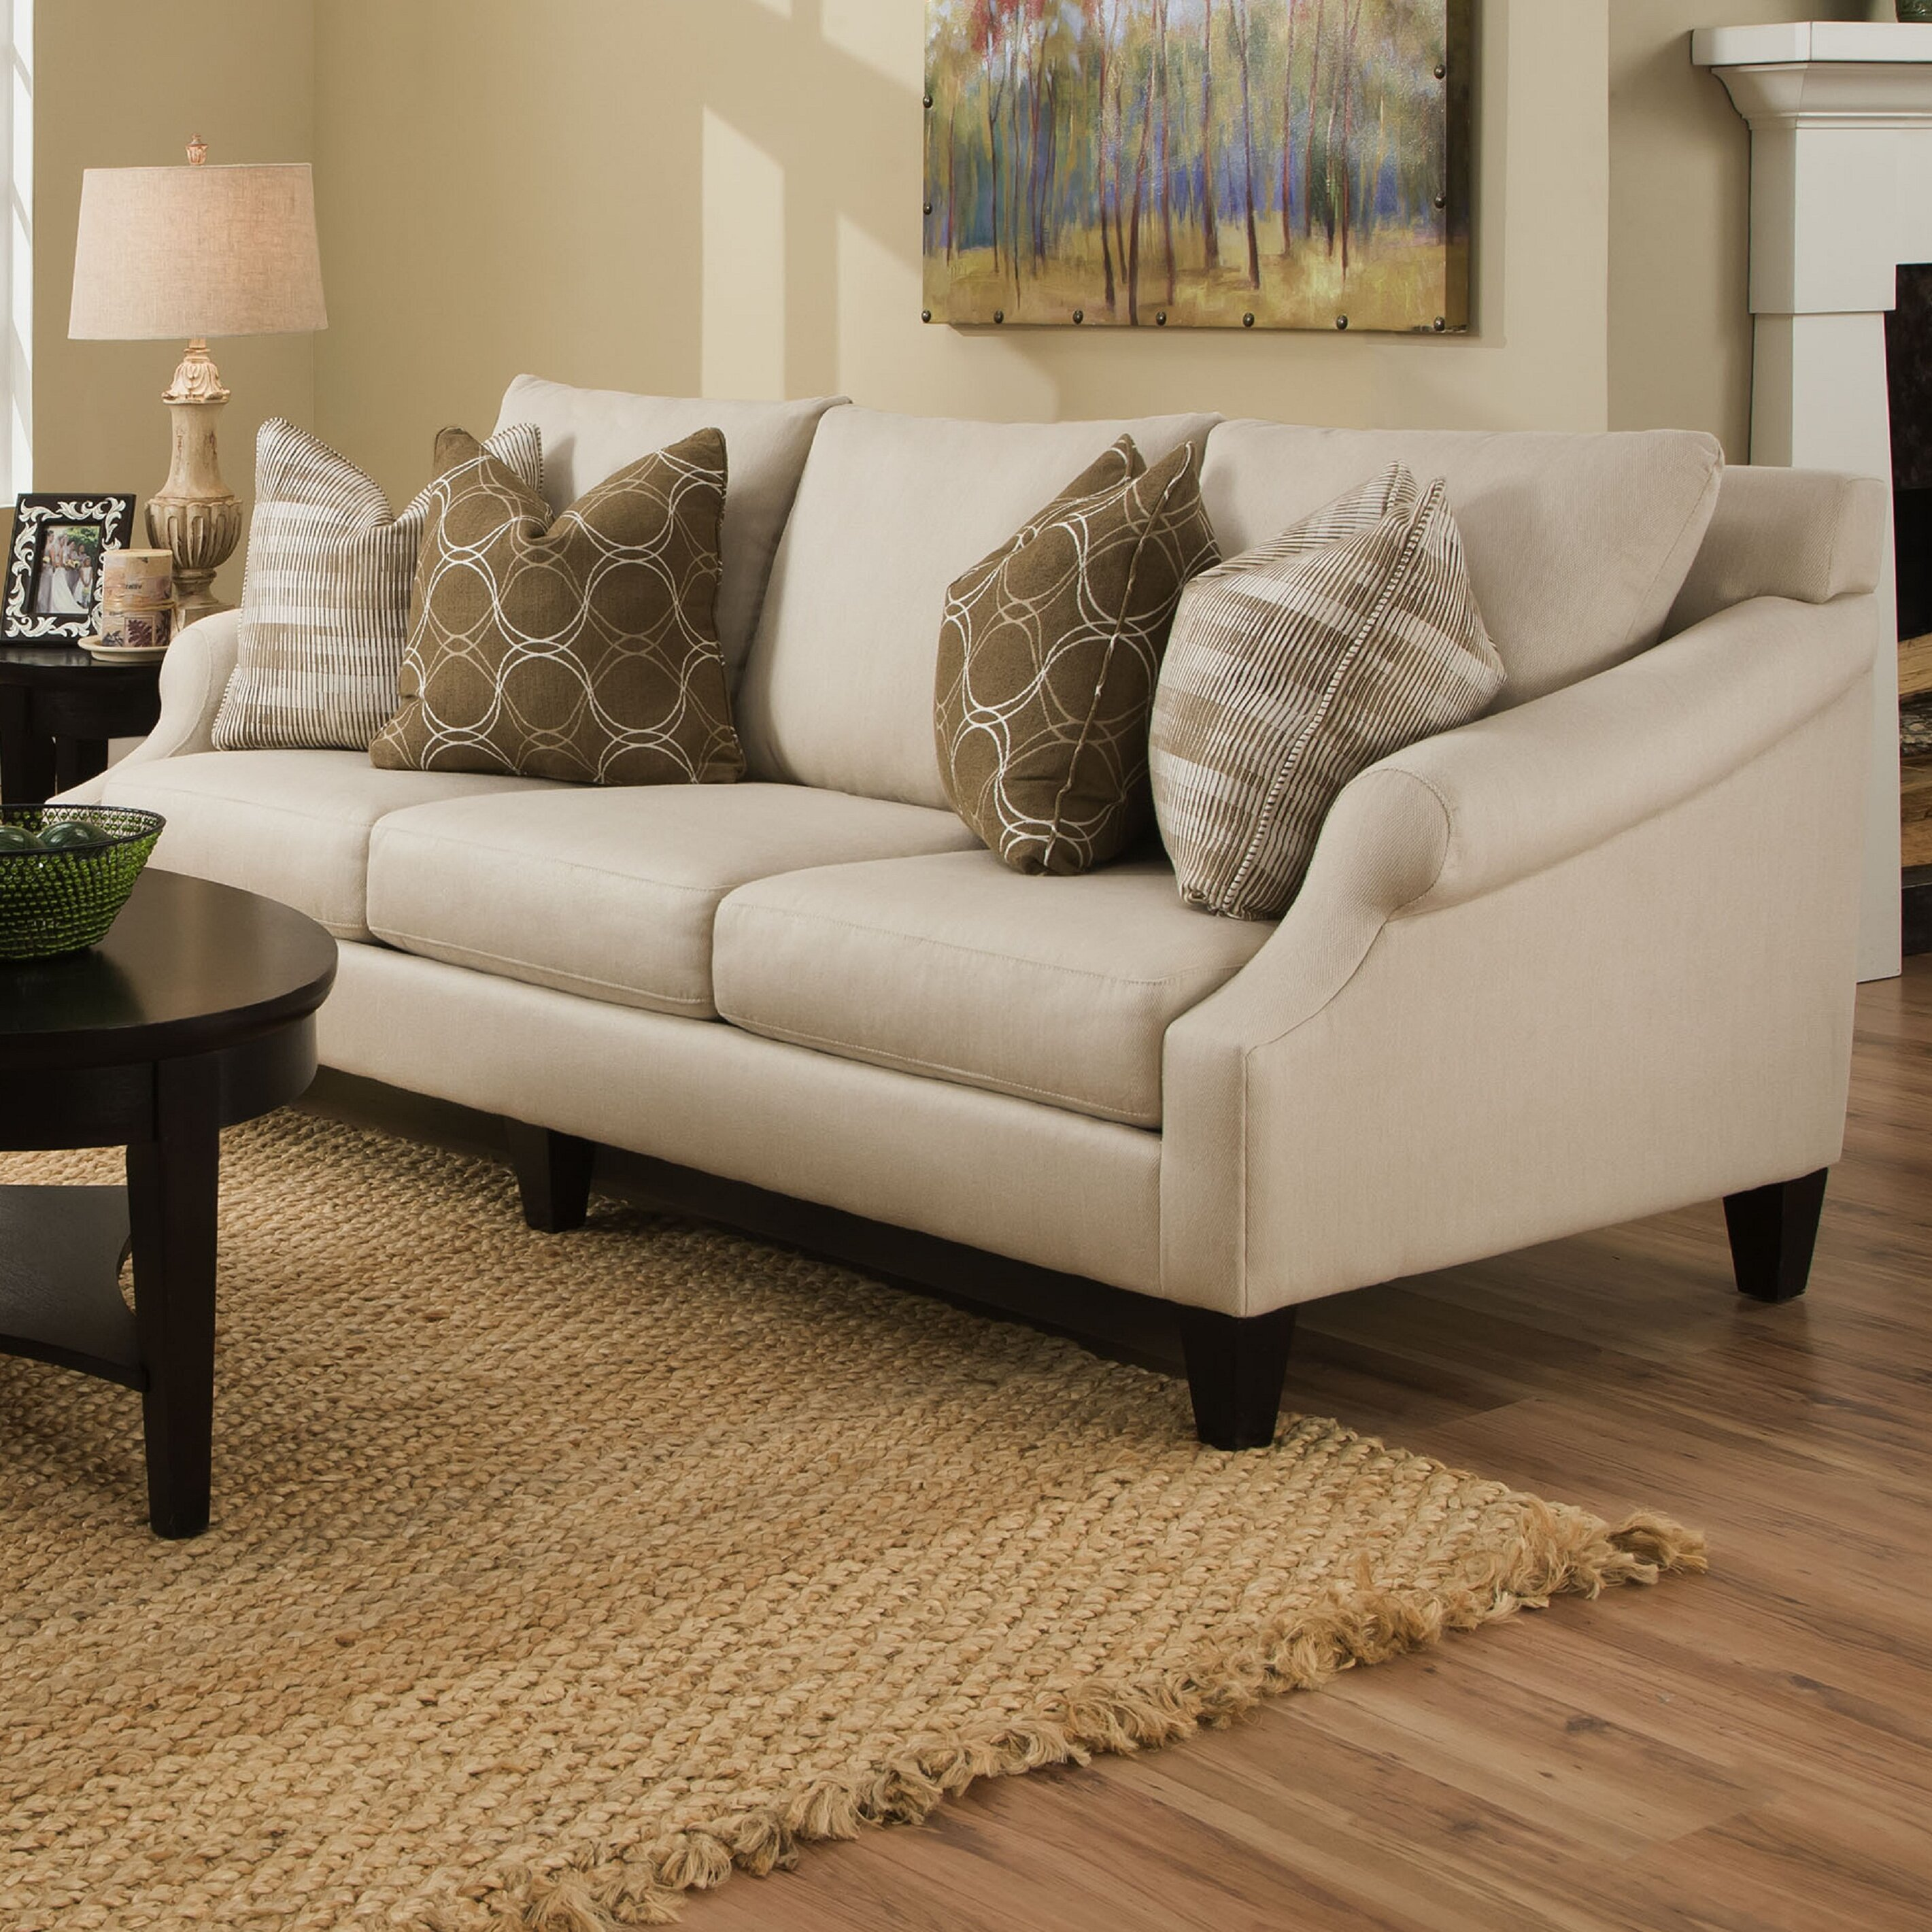 Molly Extra Long Pique Flax Sofa. By Bauhaus